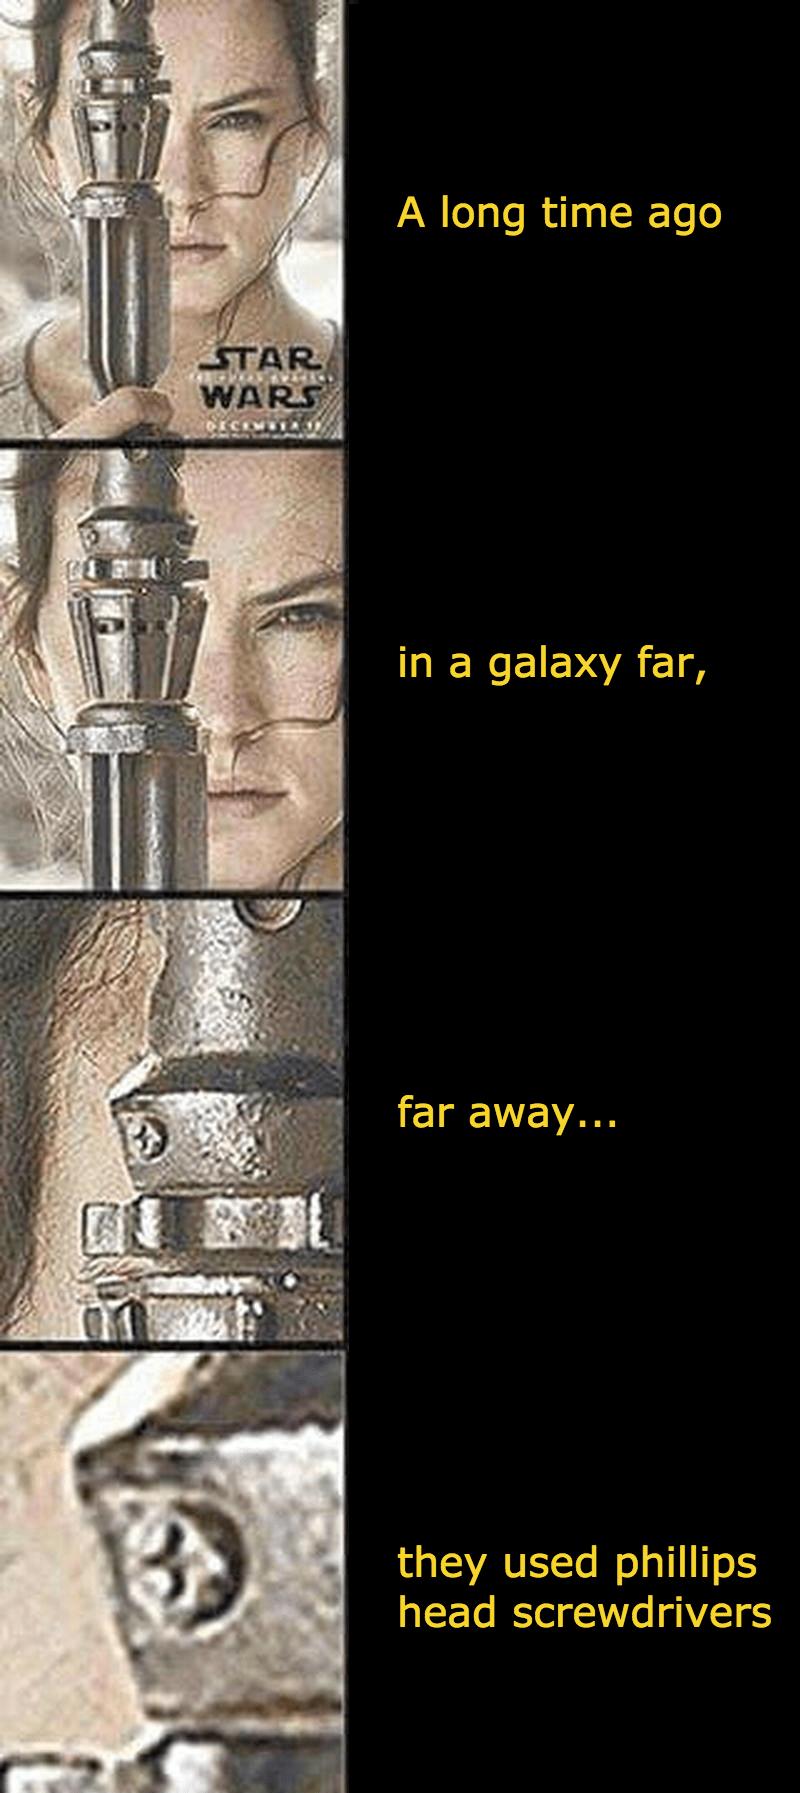 screwdriver scifi star wars seems legit - 8759291648